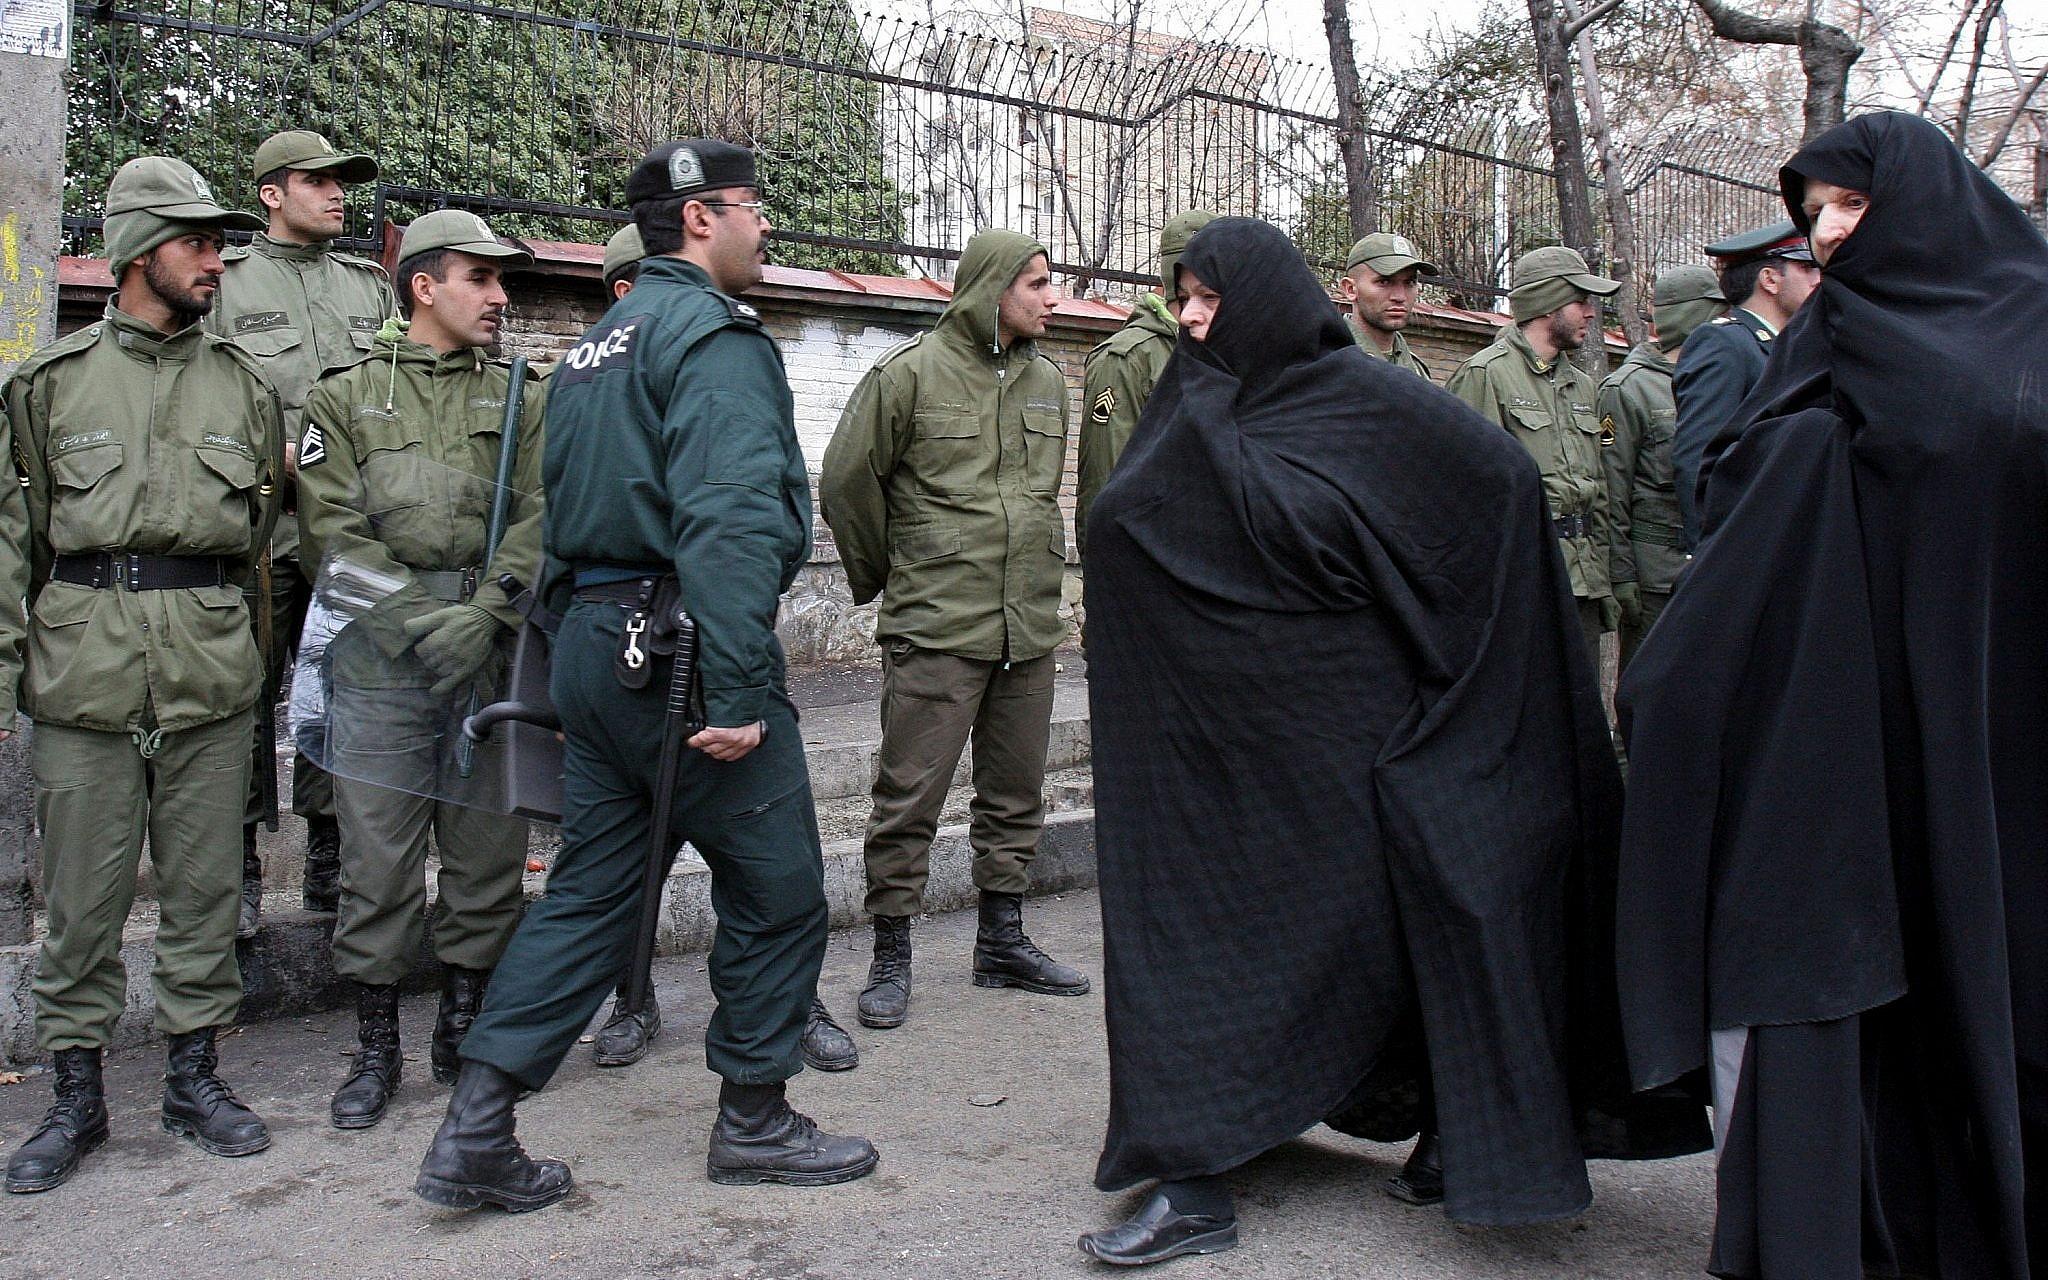 Danes accuse Iran of failed murder plot